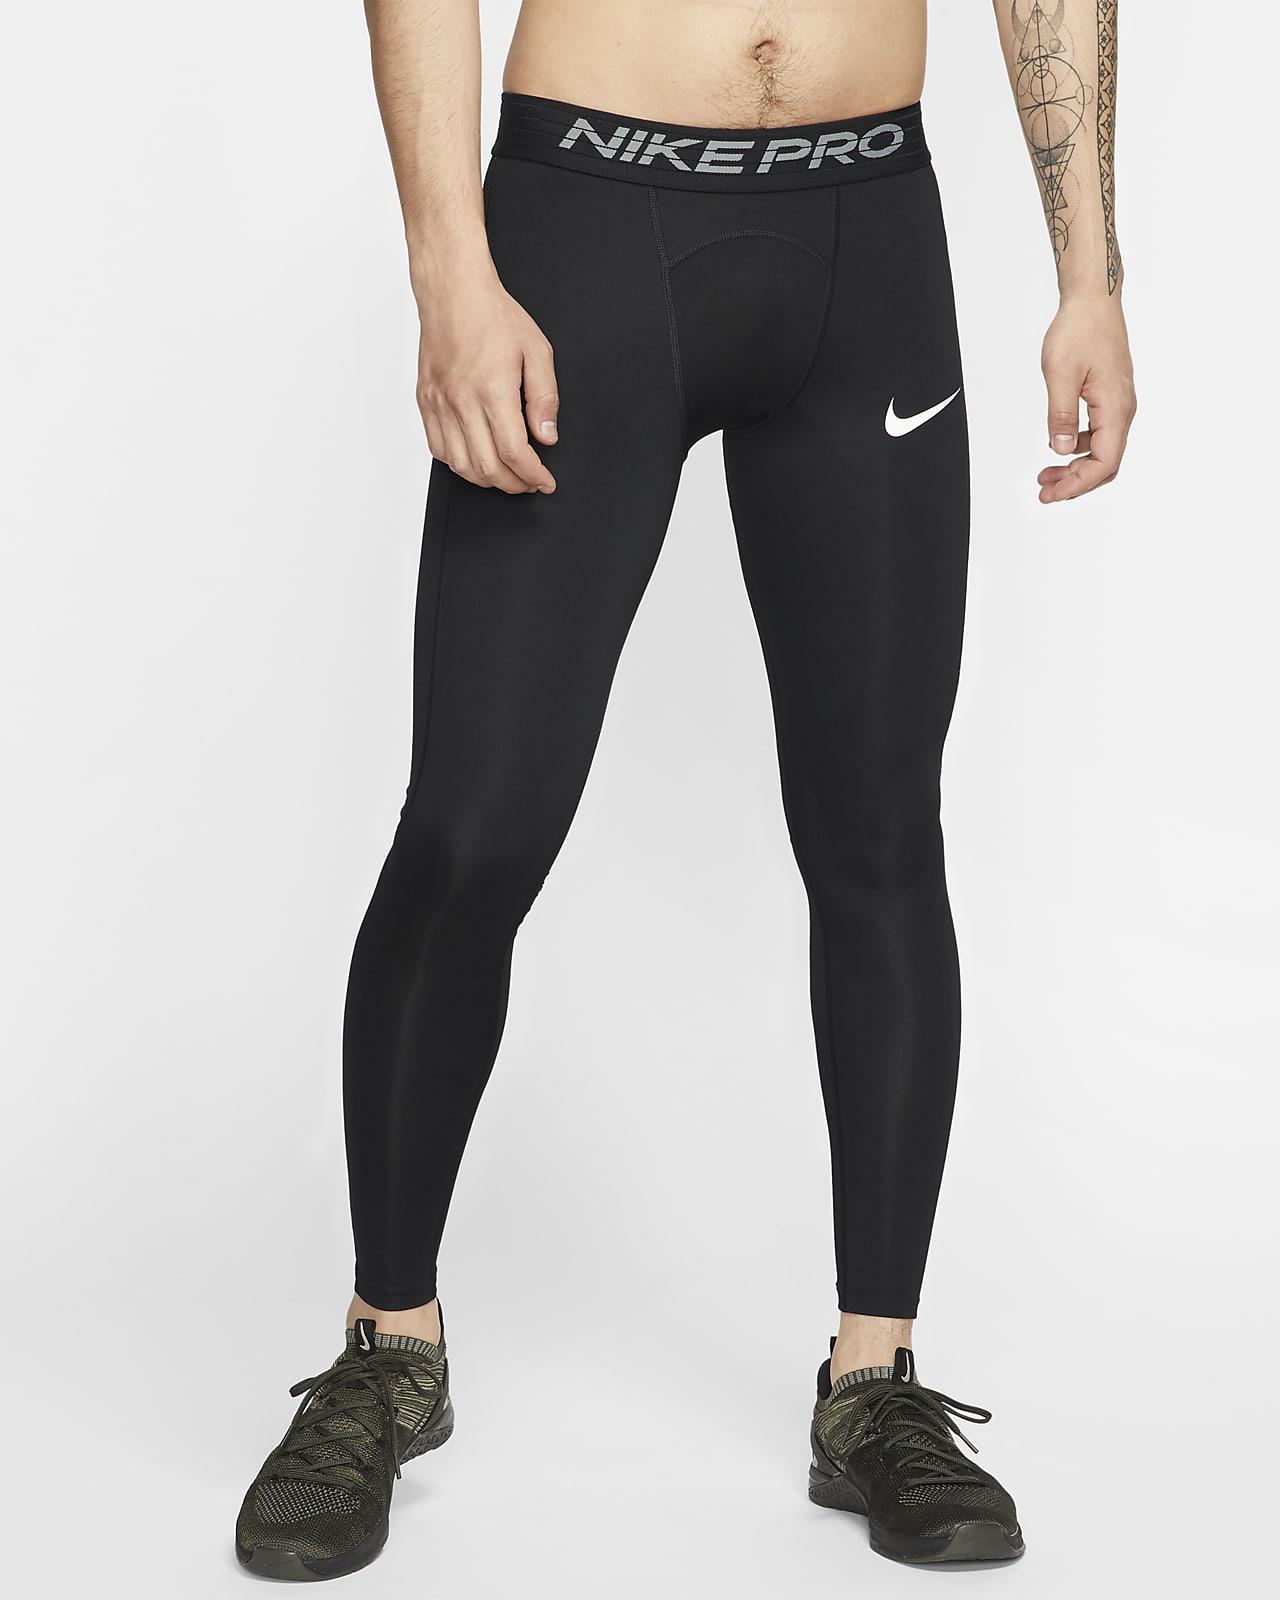 Nike Pro Herren-Tights